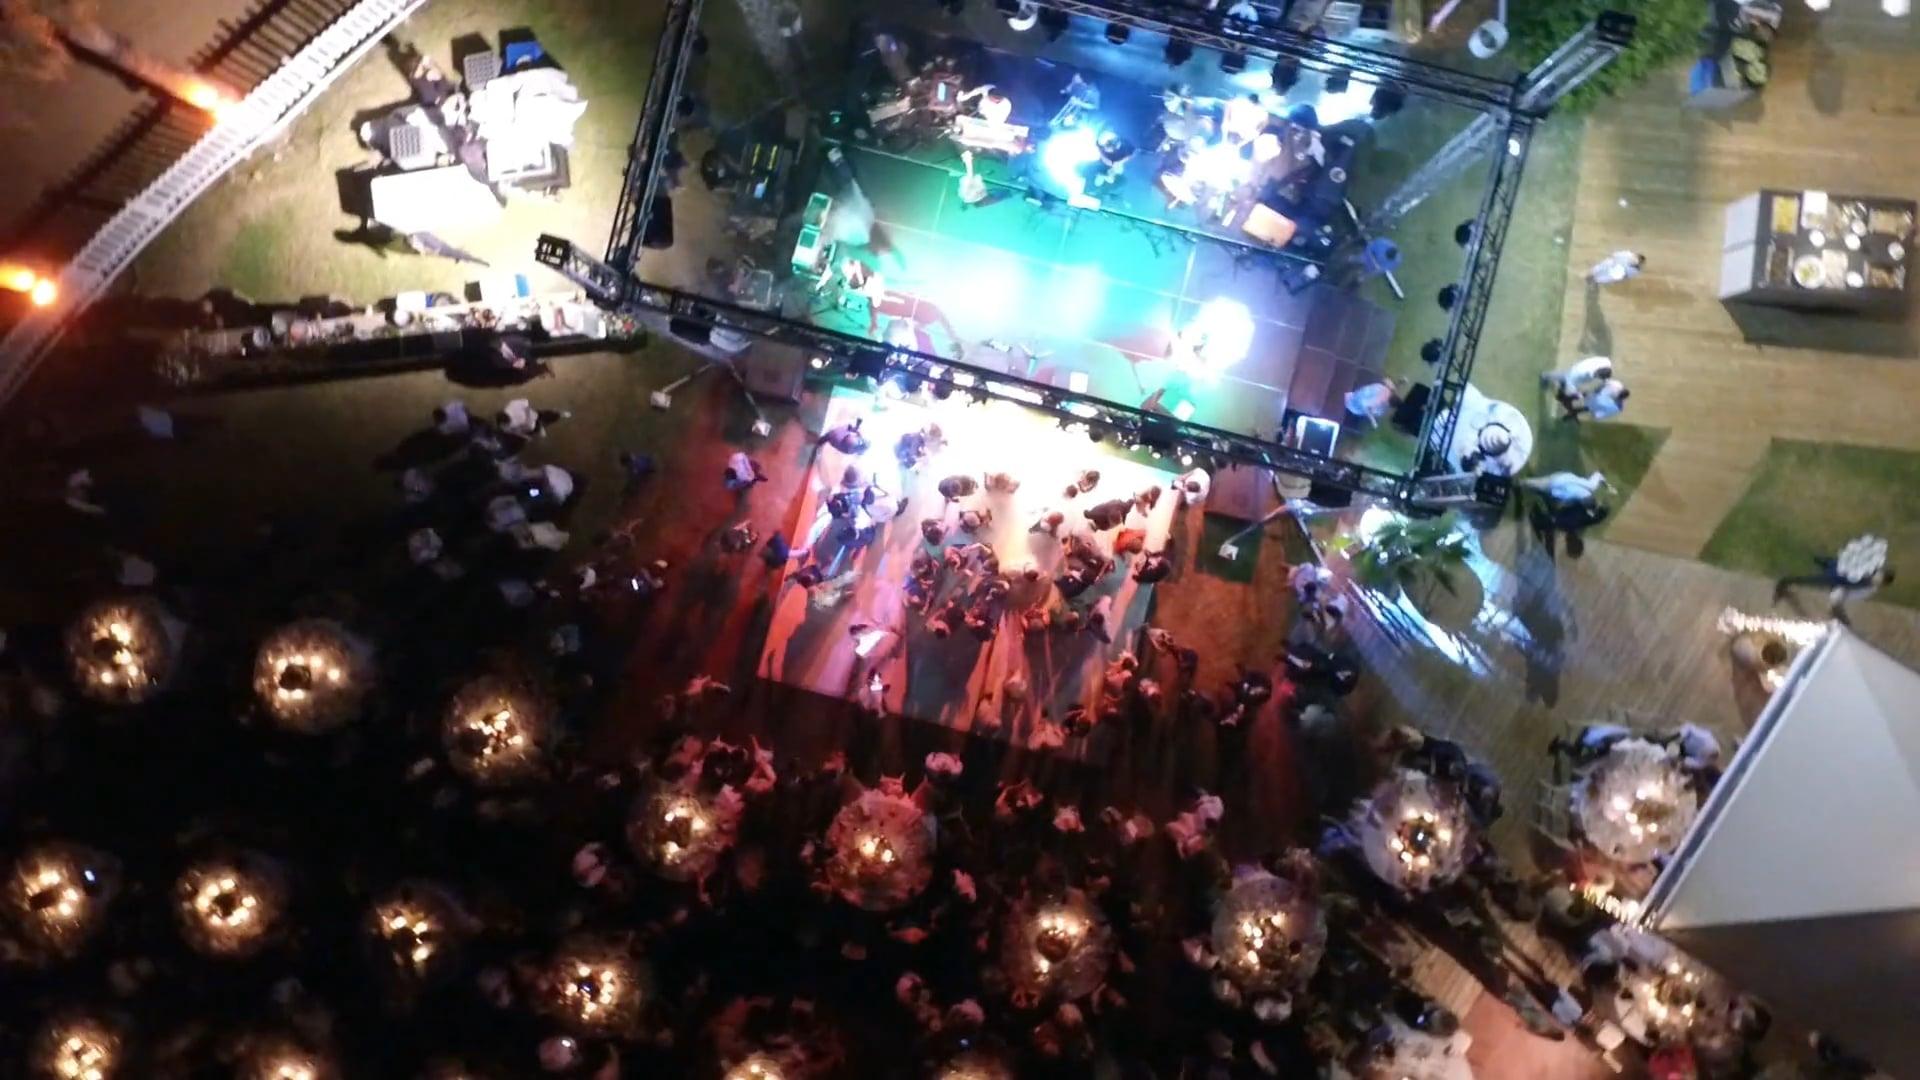 DJ Nikos Alatas, VI.P. Destination wedding in Athens Riviera with Onirama Live, Drone 11 minutes clip! www.eventacademy.gr